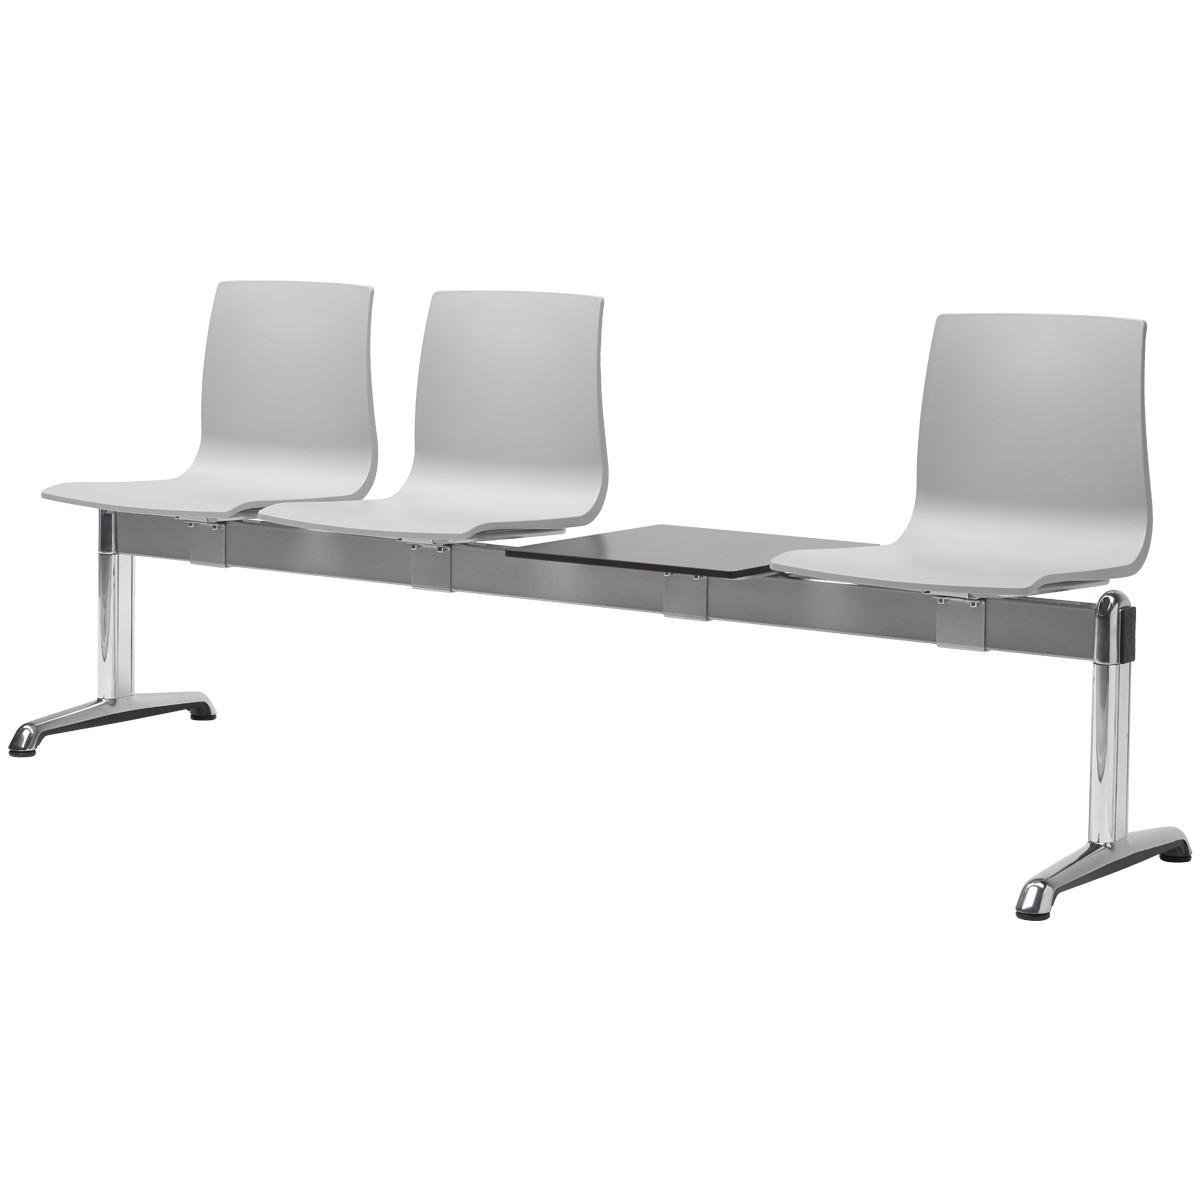 PANCA ATTESA ALICE with shelf - fire retardant seats